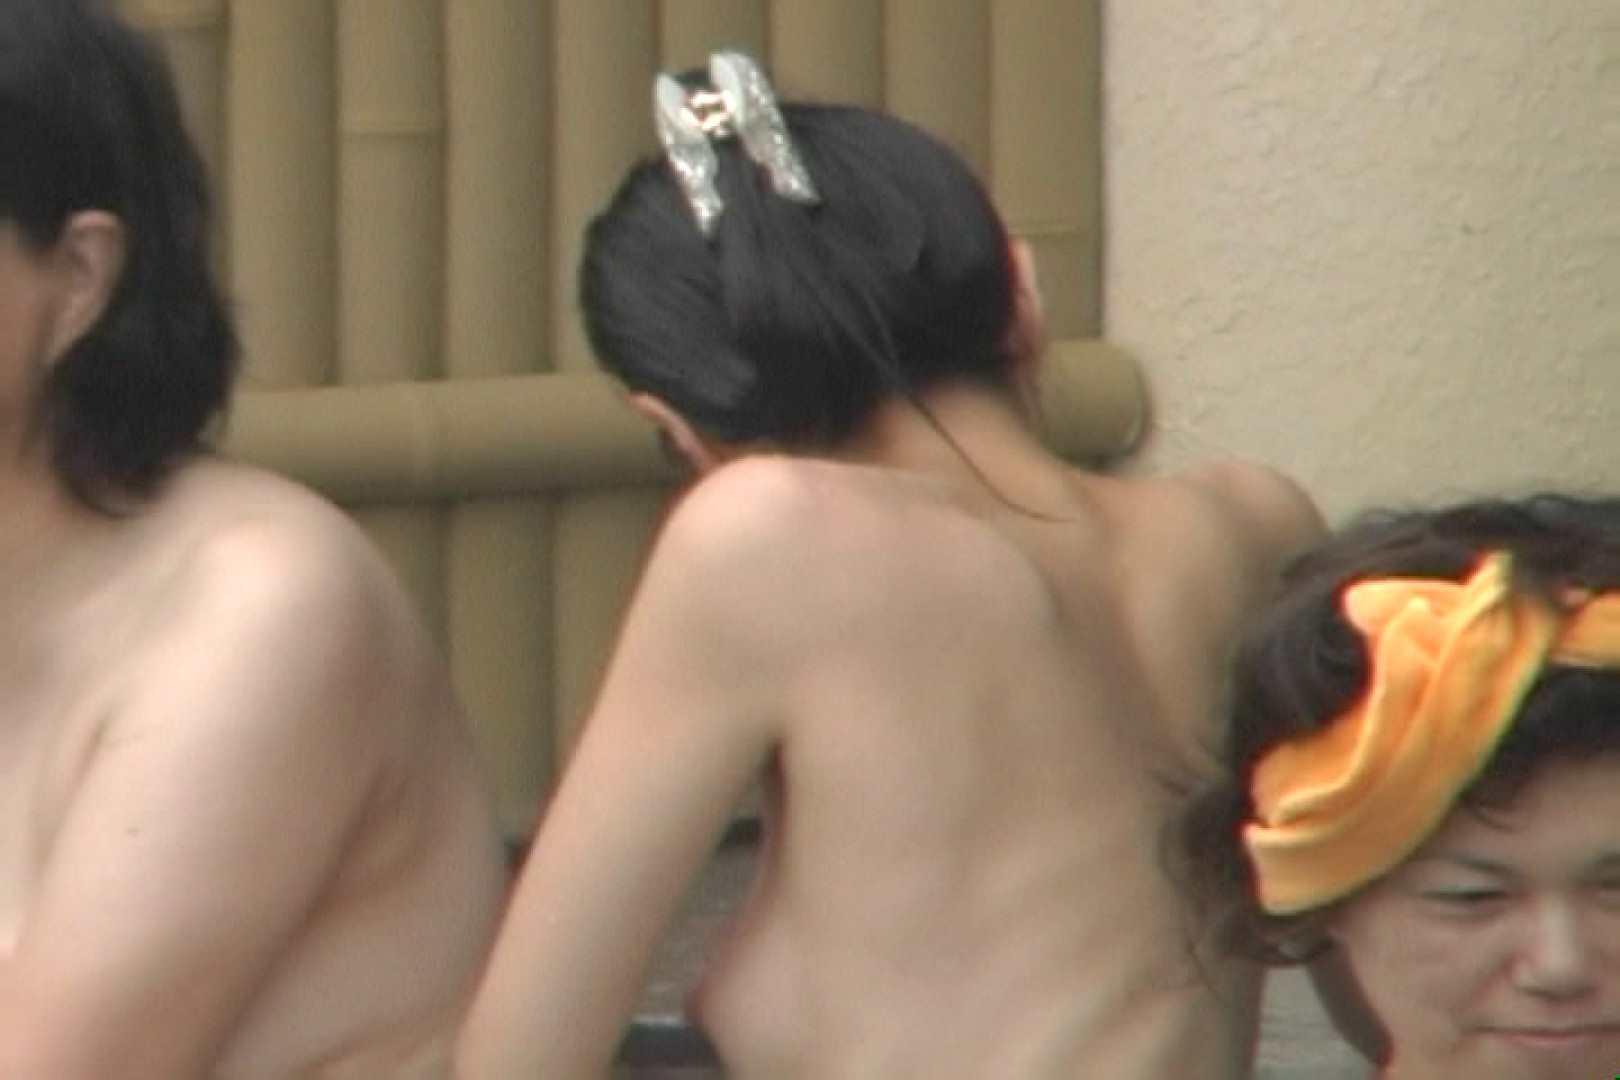 Aquaな露天風呂Vol.41 盗撮 戯れ無修正画像 89枚 38